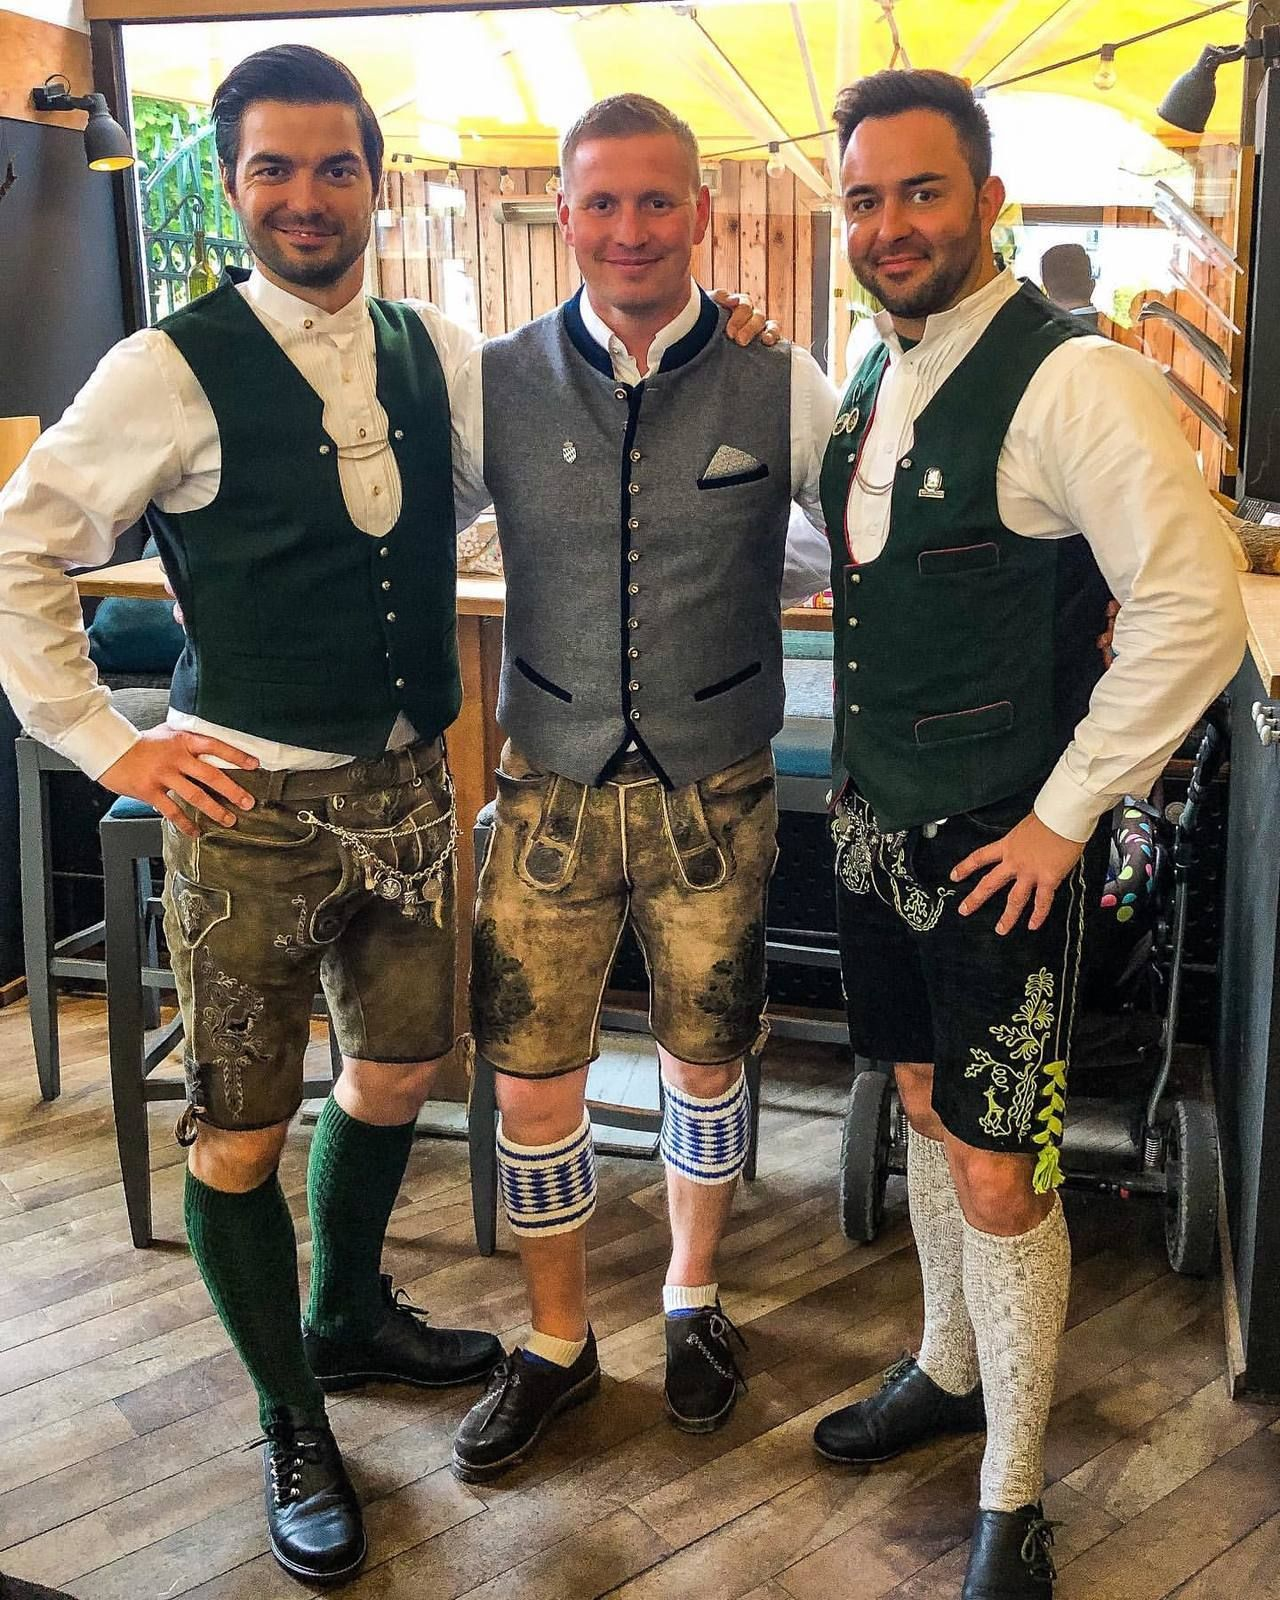 Pantalon cuir Trachtenhose Costume traditionnel costumes Oktoberfest Wiesn Wasn Messieurs Slogan Pantalons